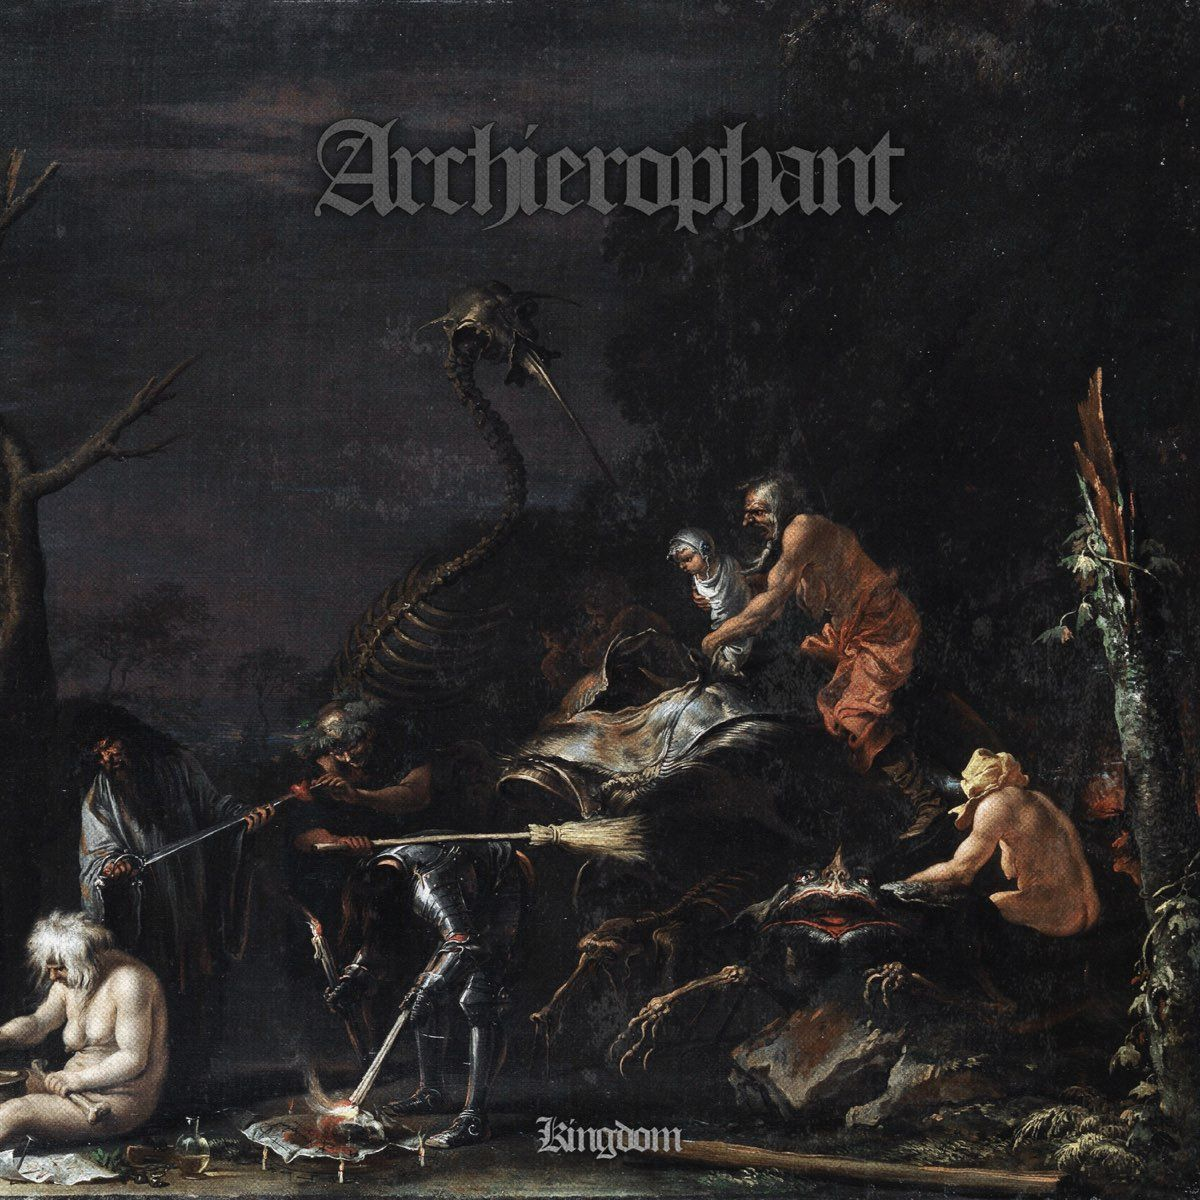 Archierophant - Kingdom